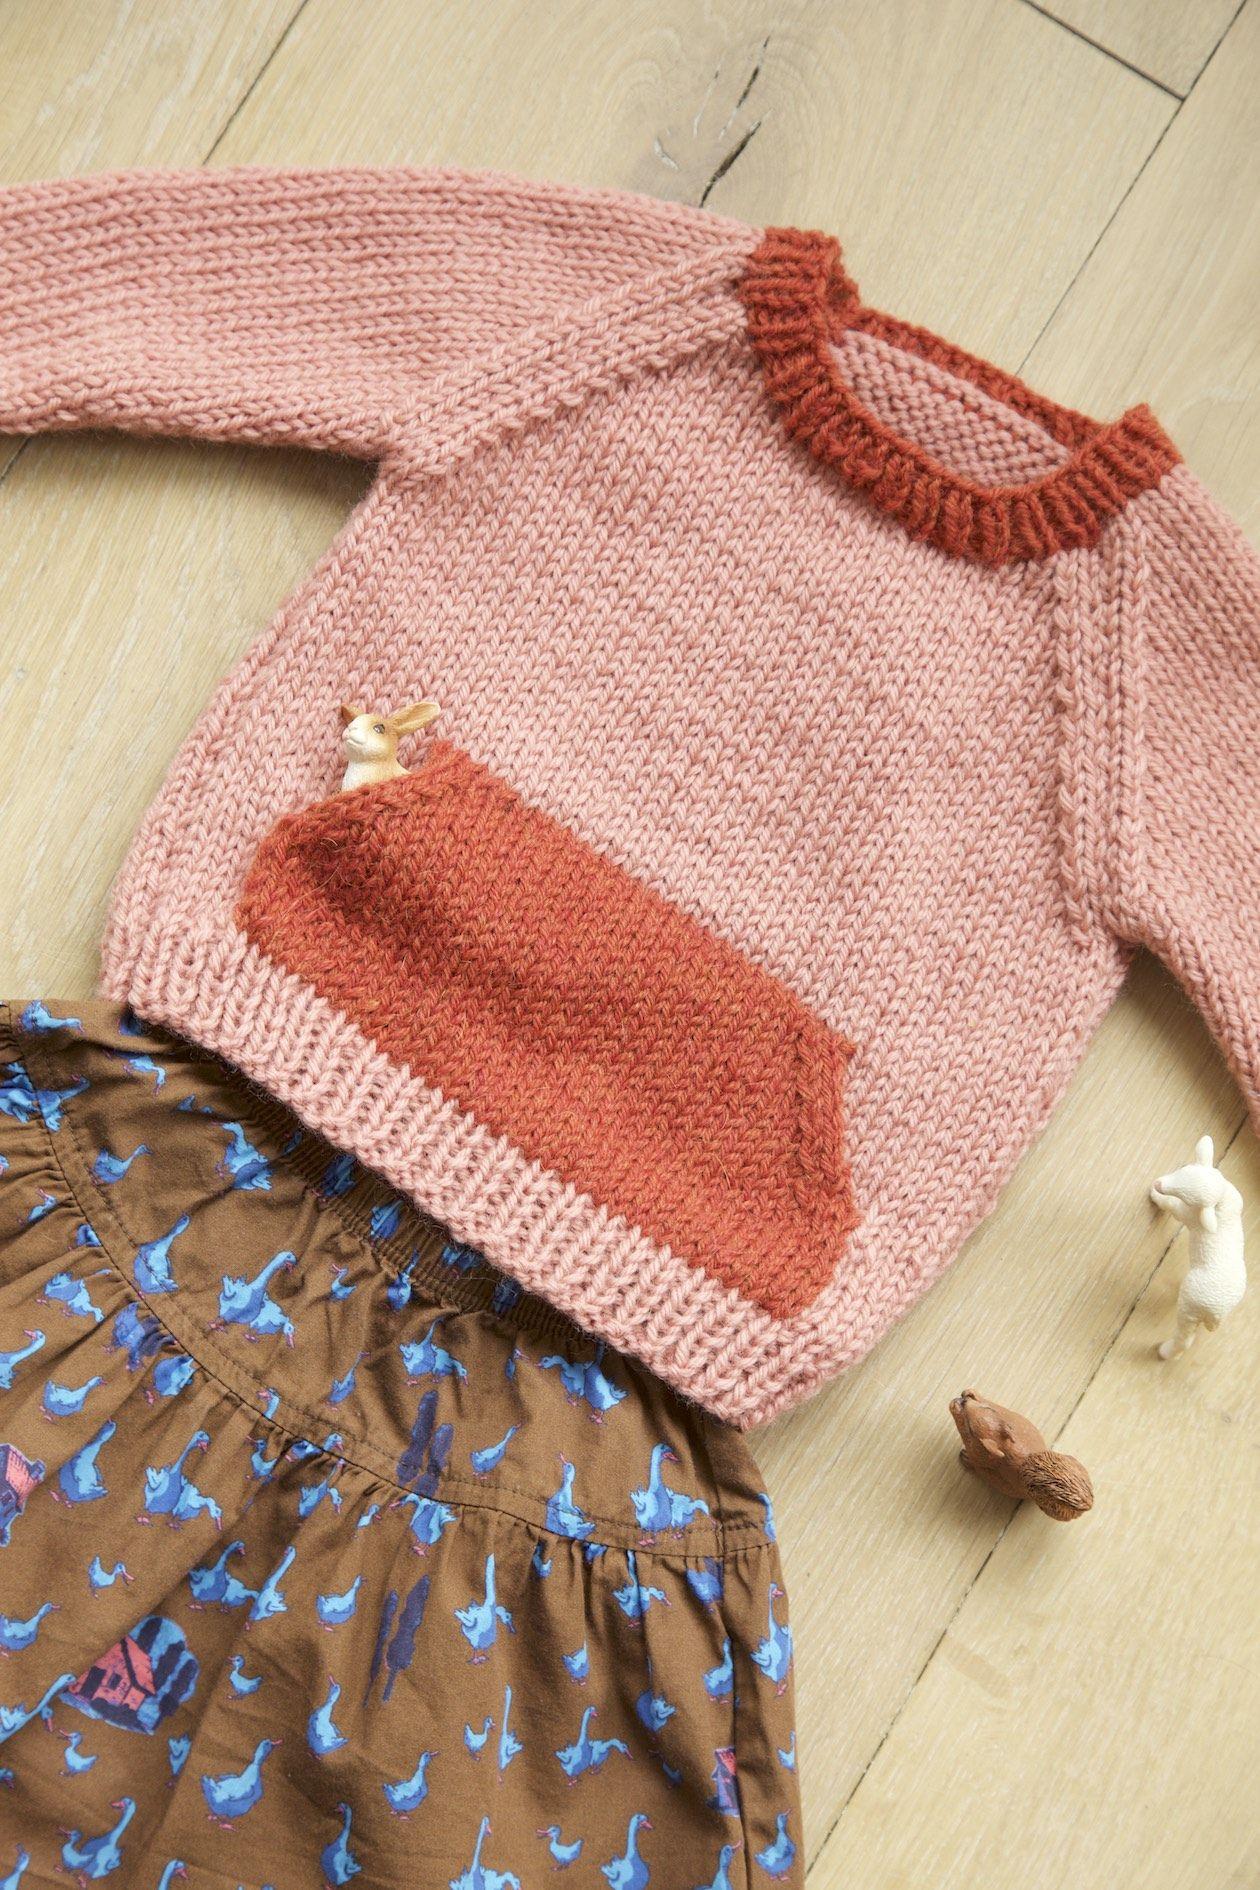 The Quokka sweater knitting pattern: a customised knitting